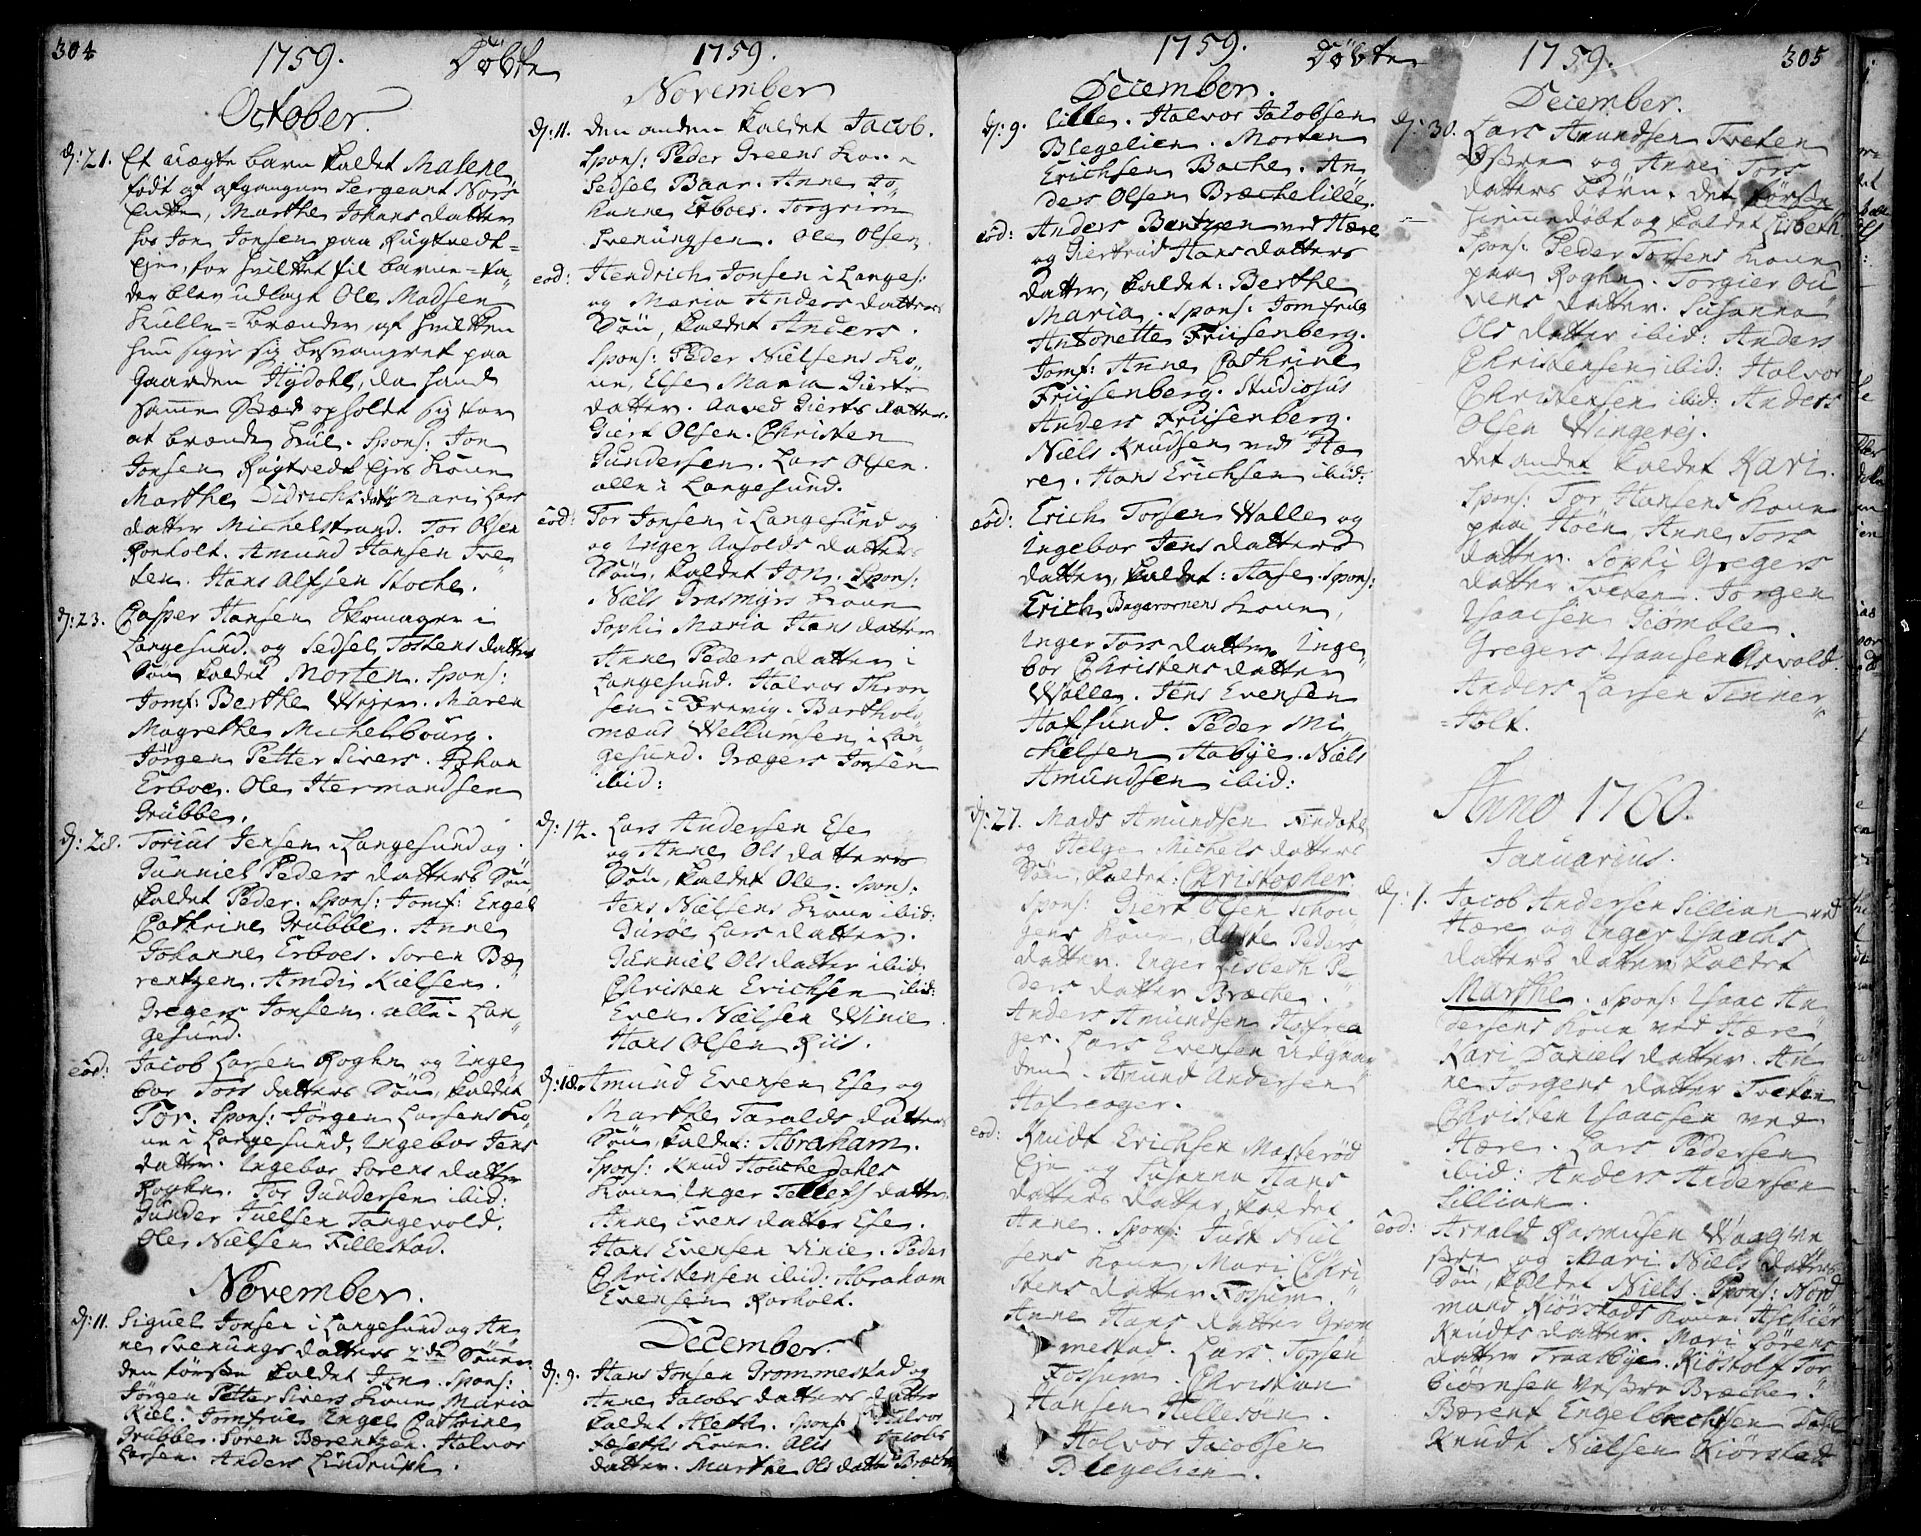 SAKO, Bamble kirkebøker, F/Fa/L0001: Ministerialbok nr. I 1, 1702-1774, s. 304-305